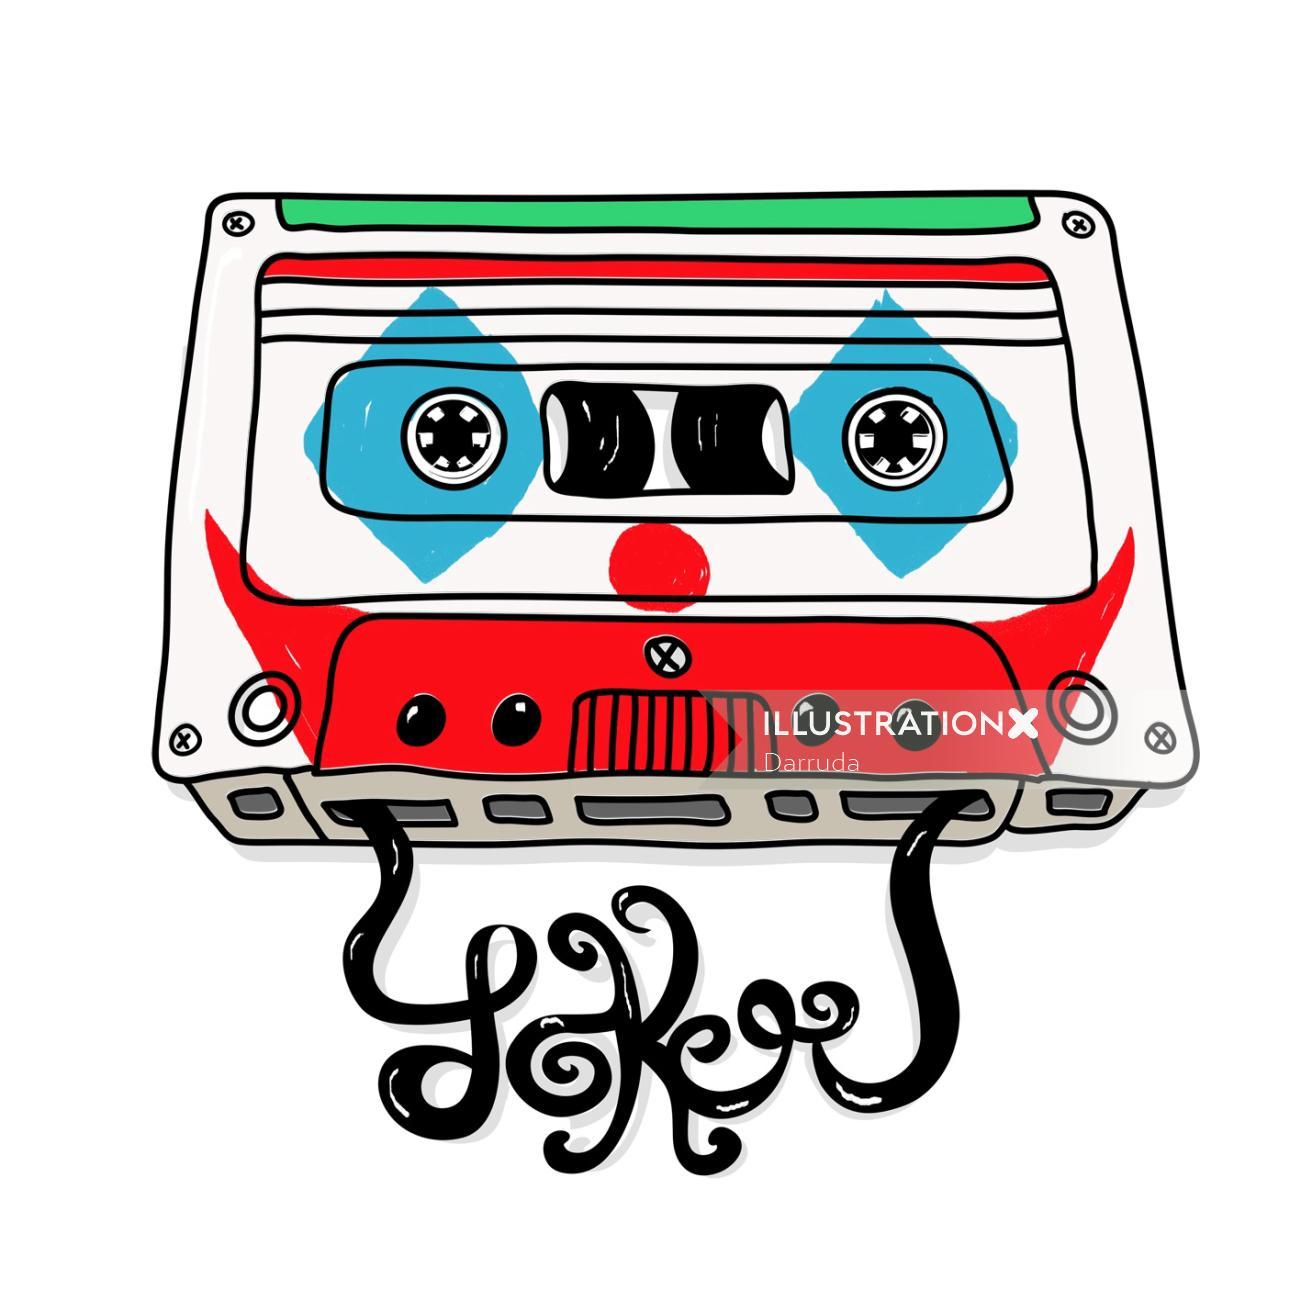 Graphic illustration of music cassette